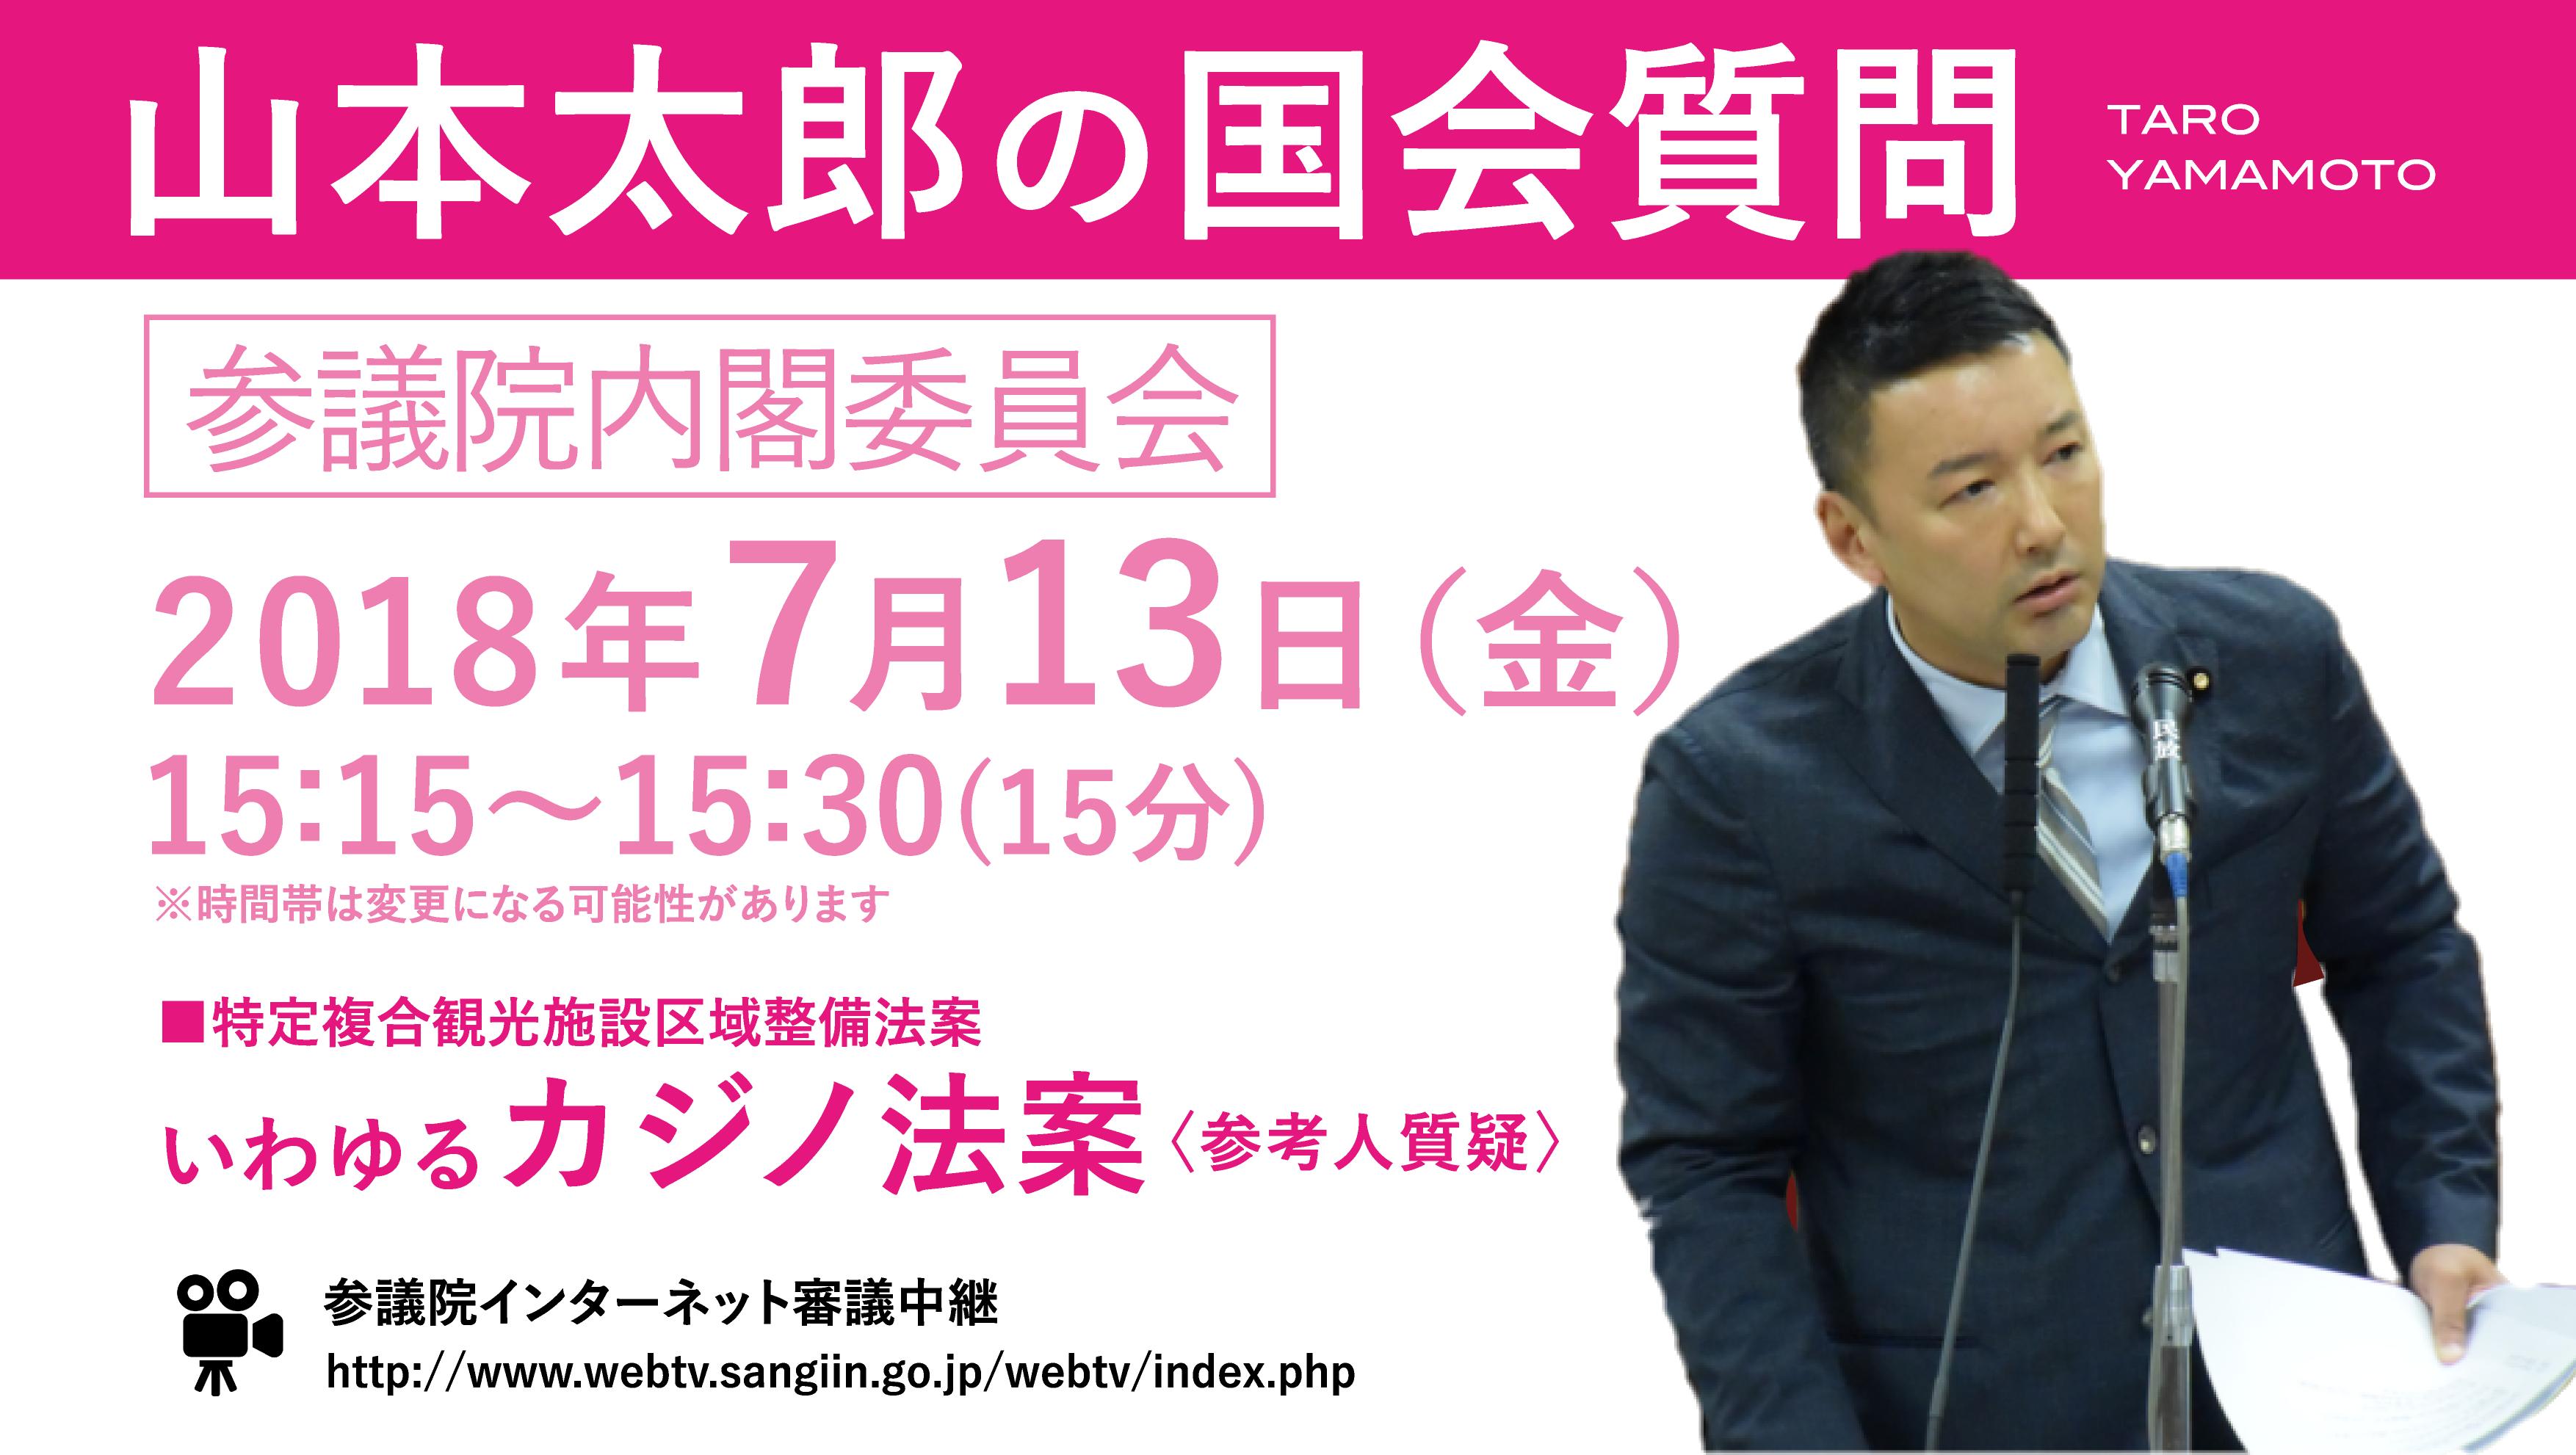 taroyamamoto_0813-01